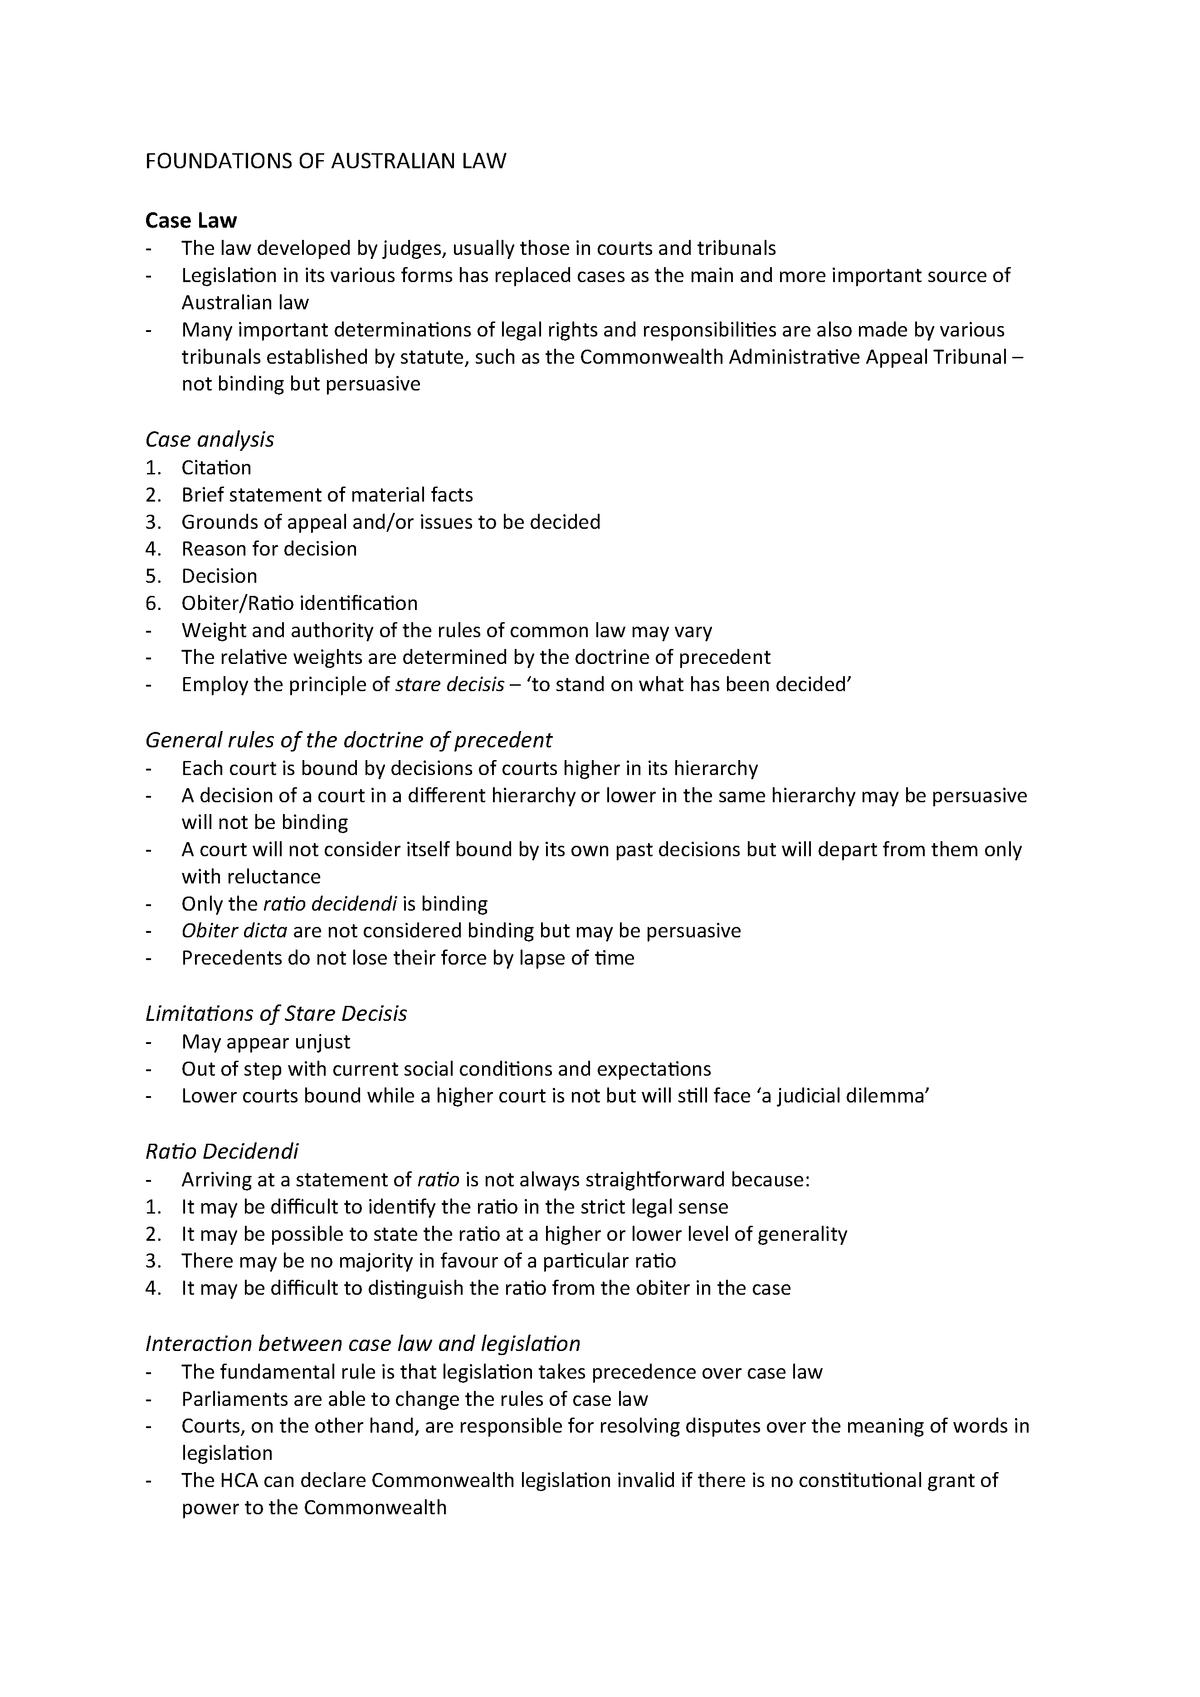 Summary Laying Down the Law tutorial work Tutorials Week 1-6